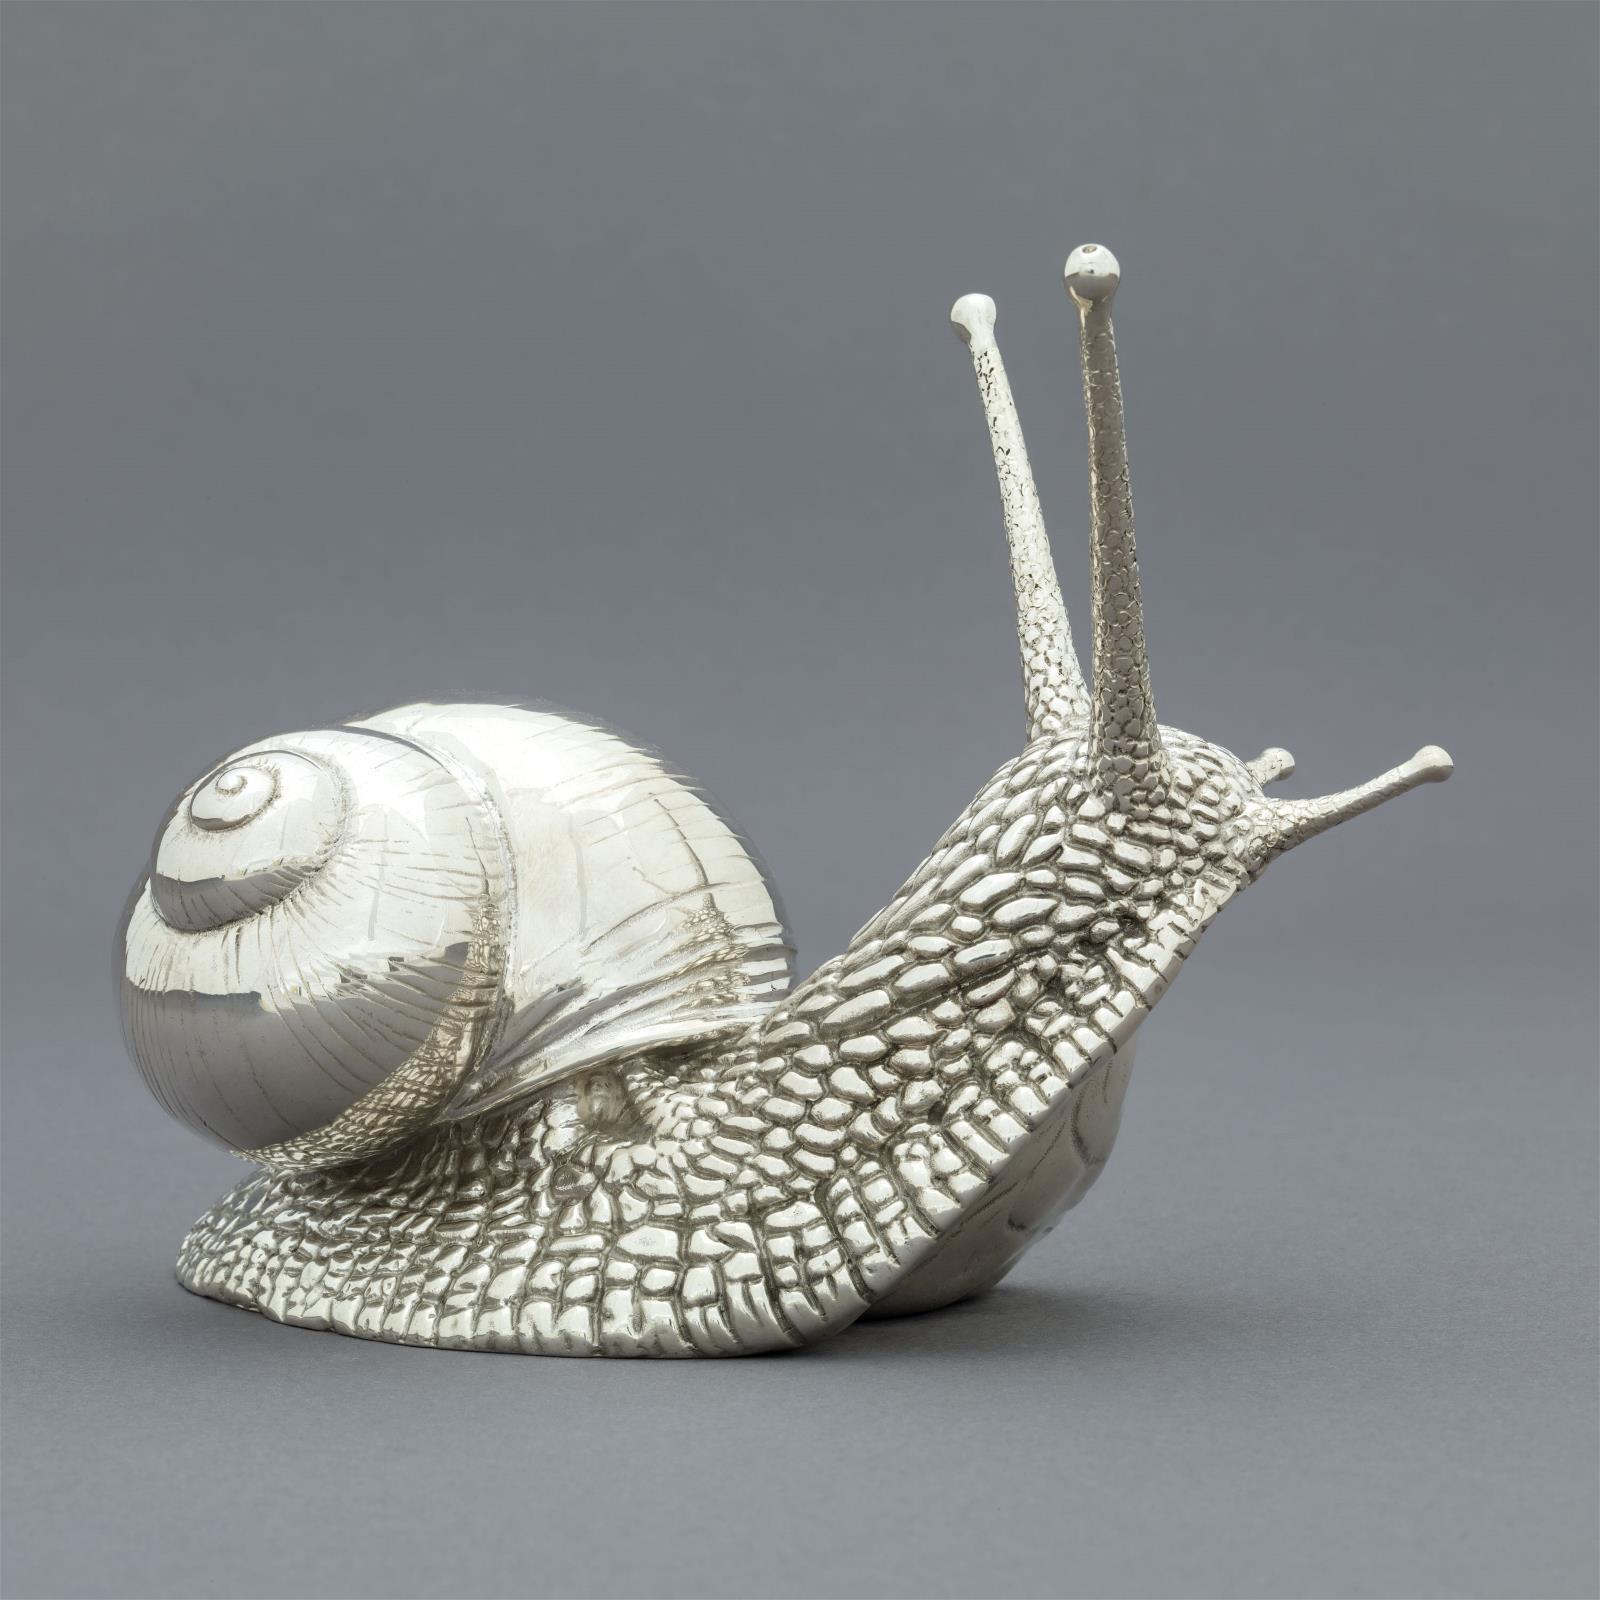 <p>Silver Garden Snail by Nick Bibby</p>